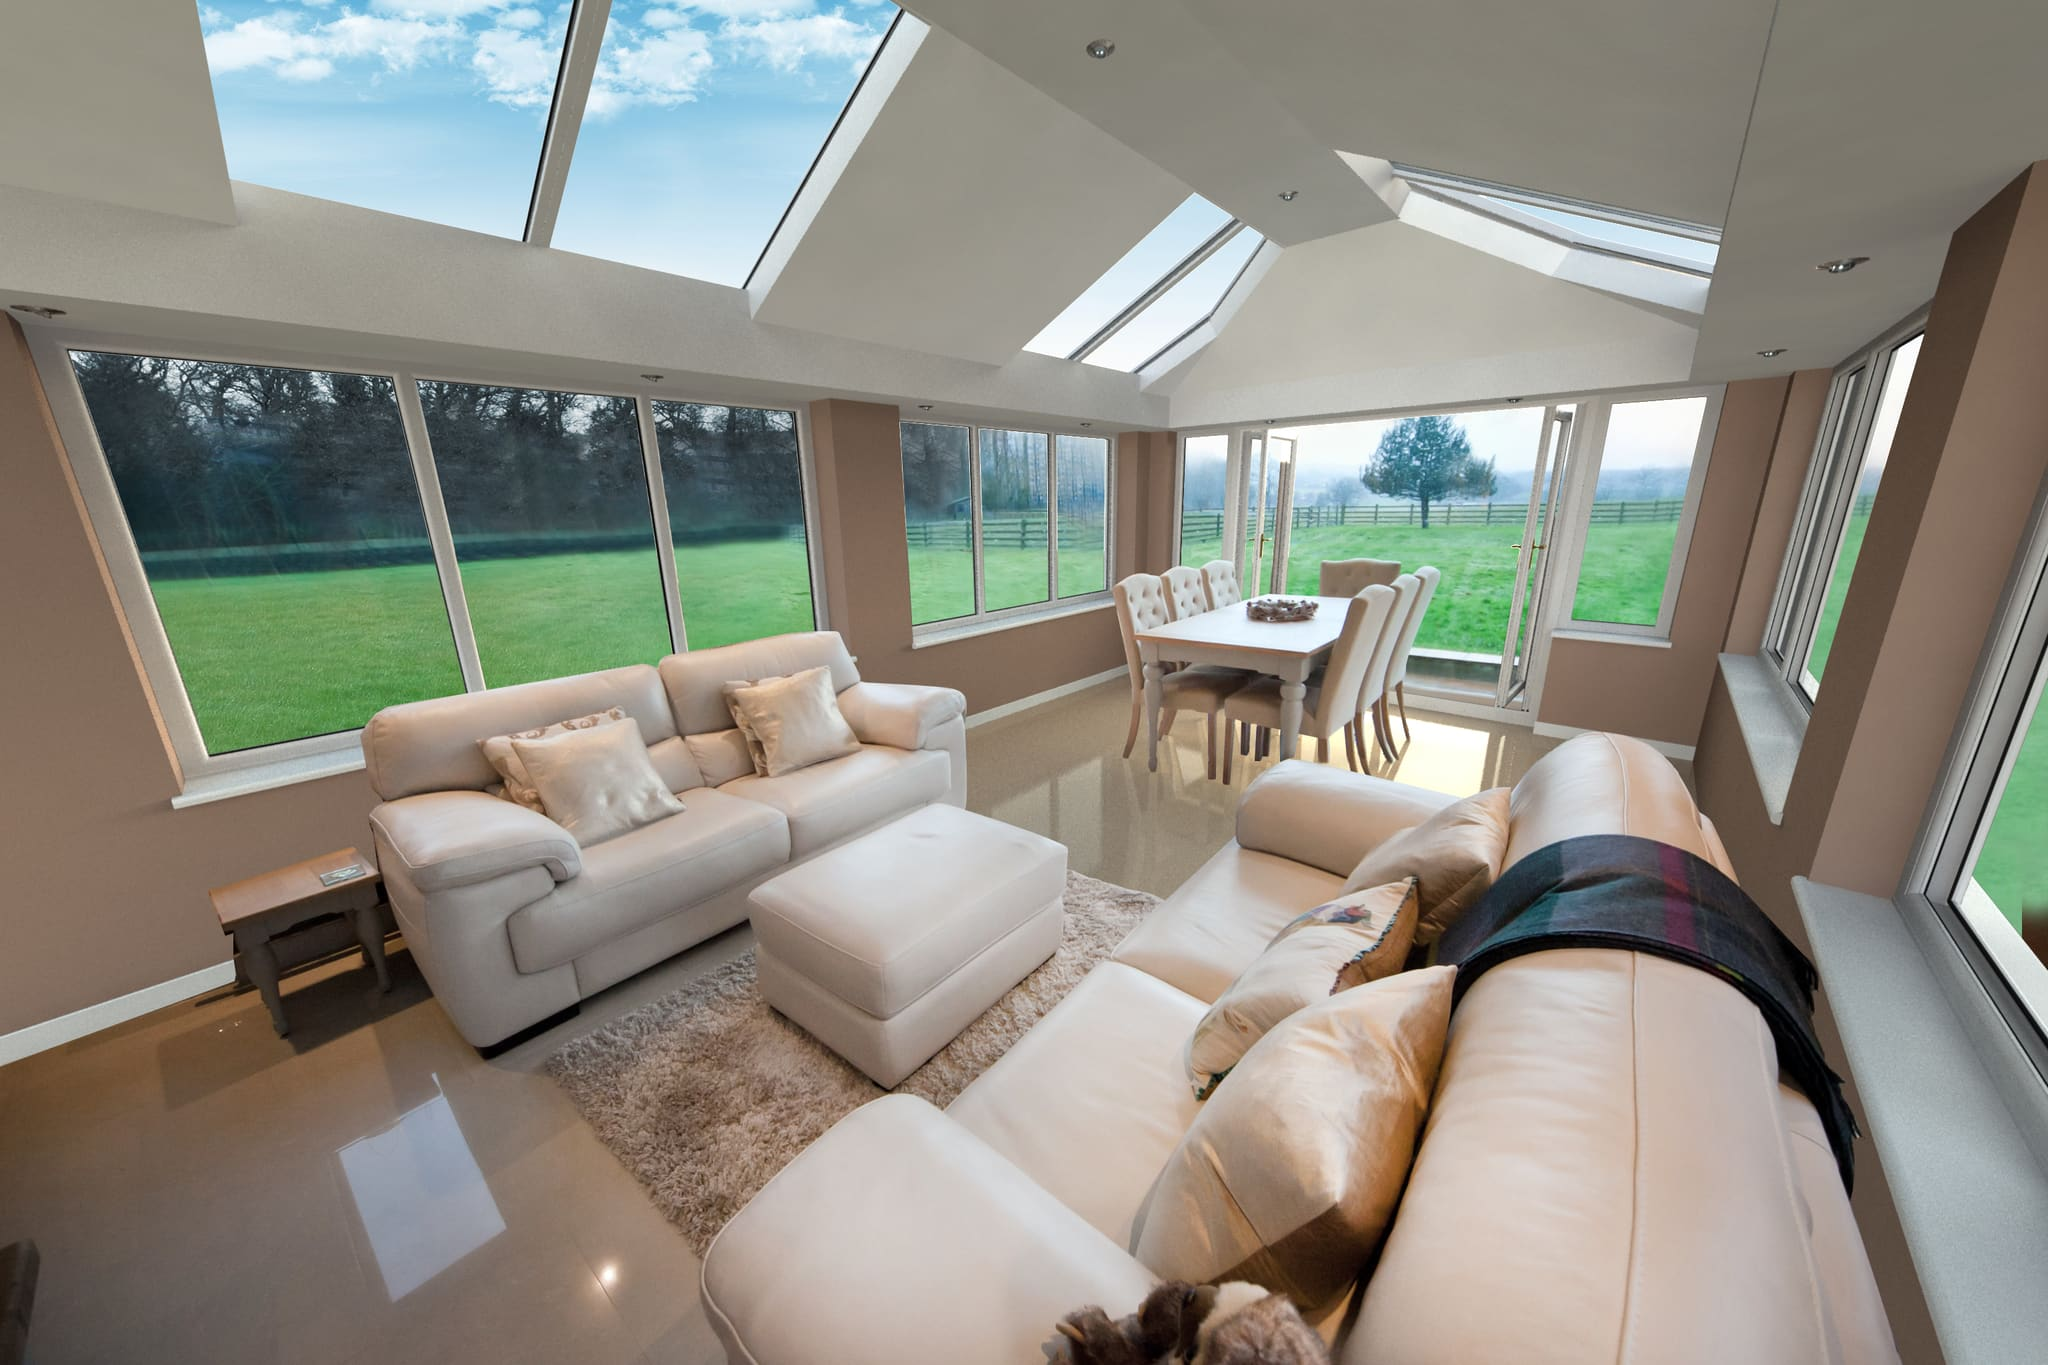 LivinROOF beautiful ceilings